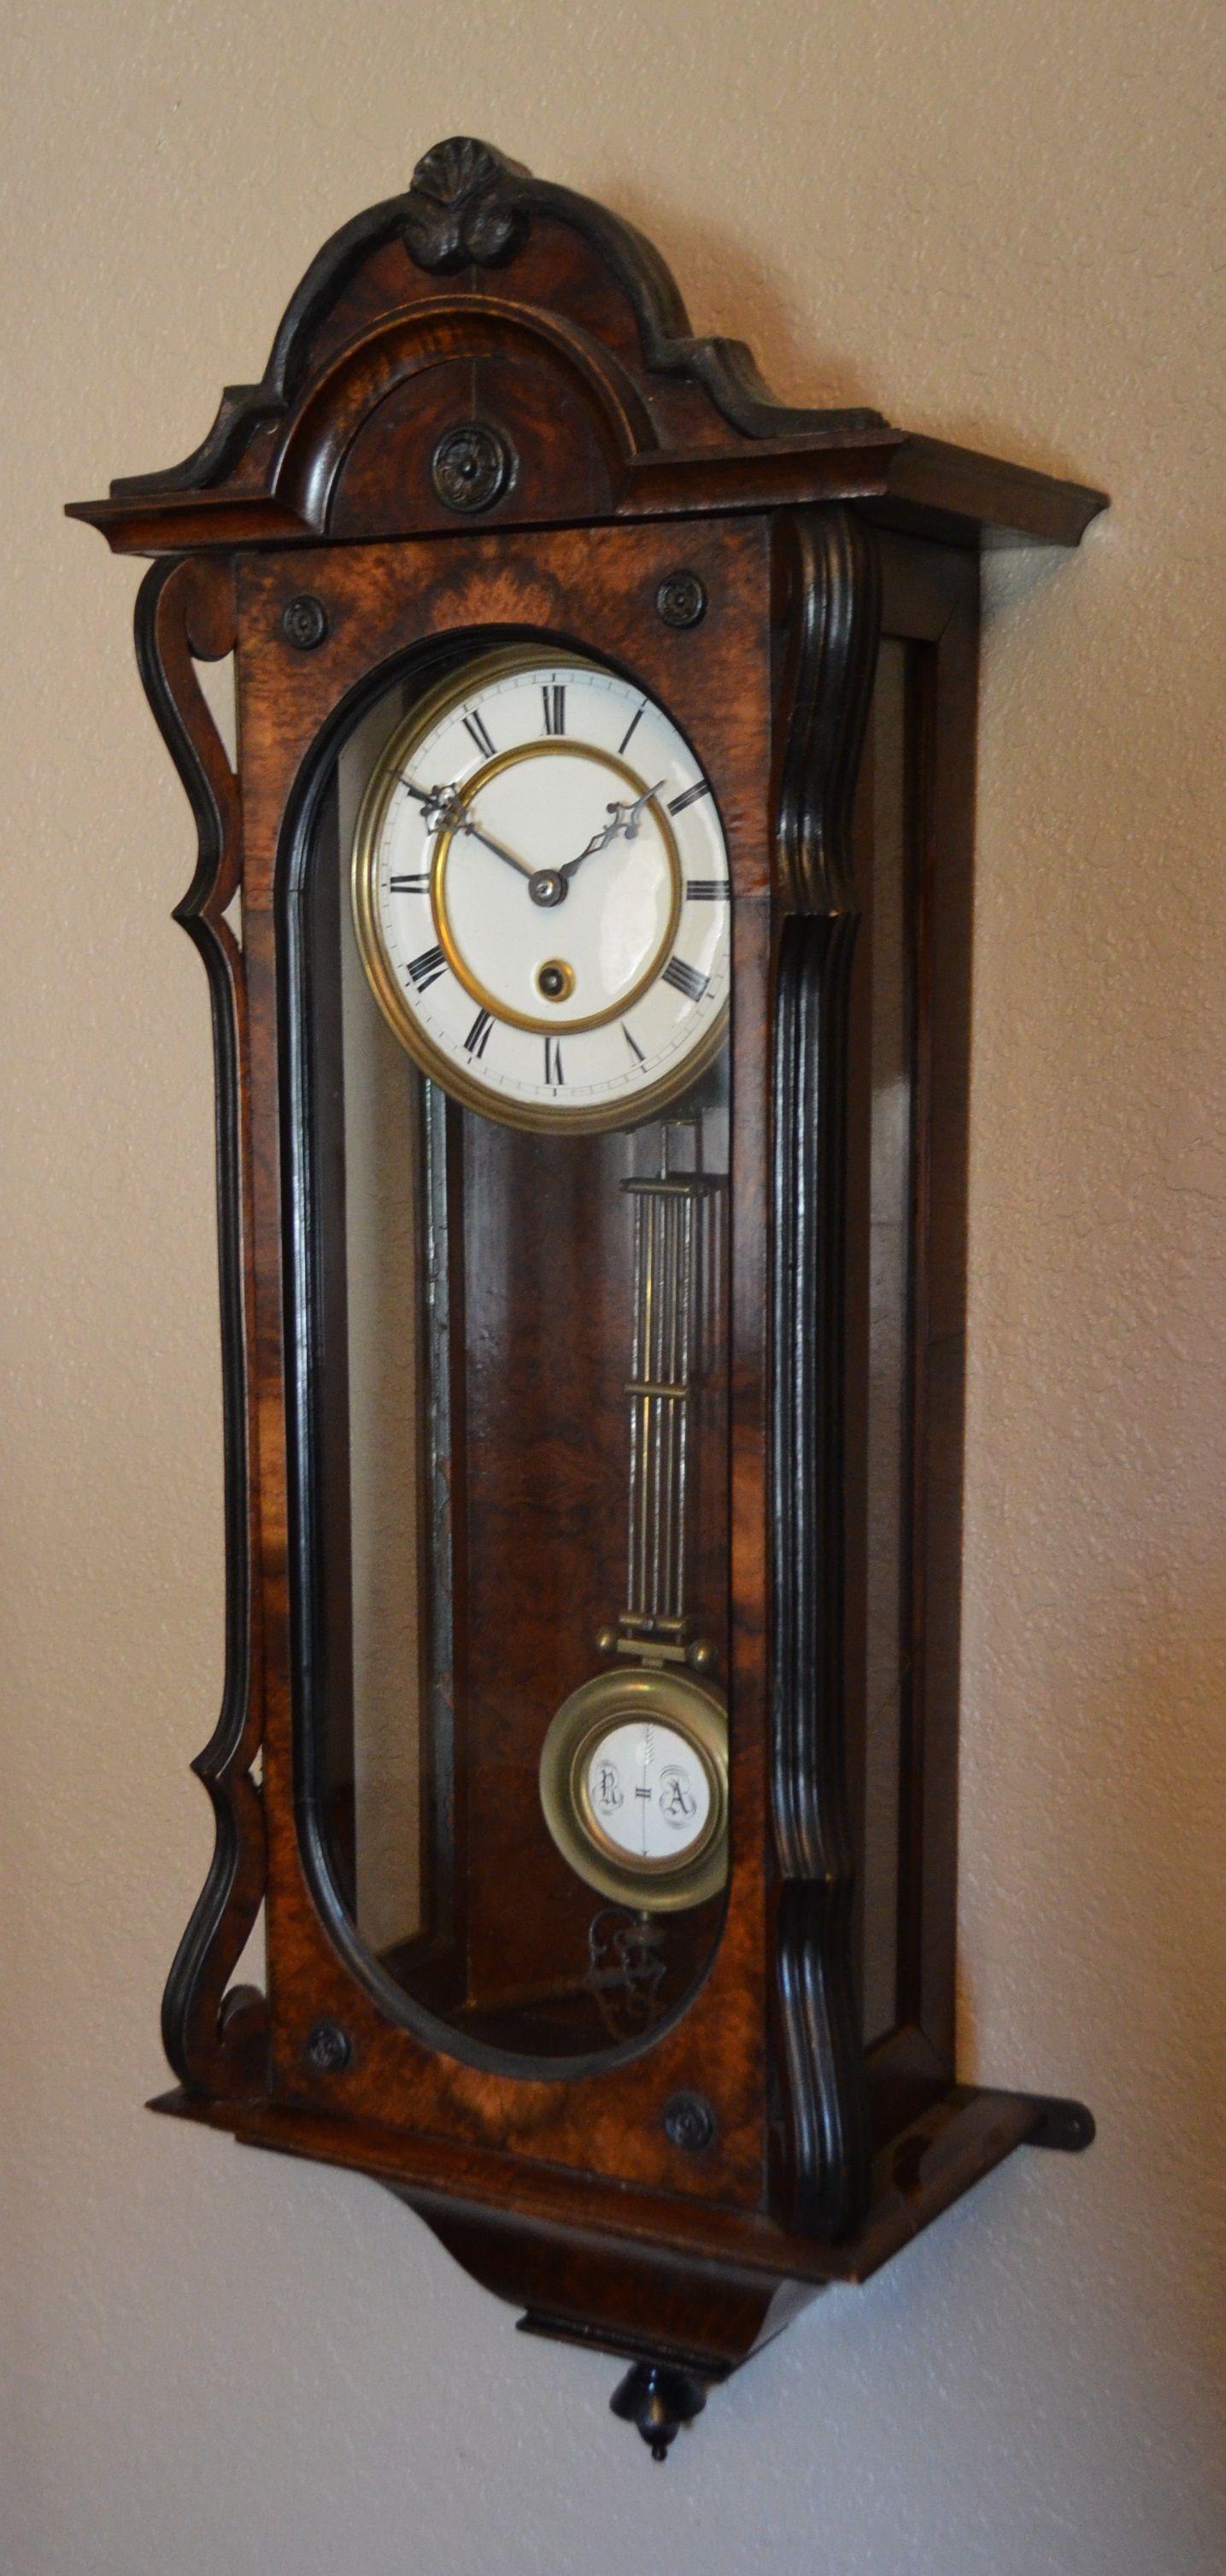 Swinging pendulum clock repair